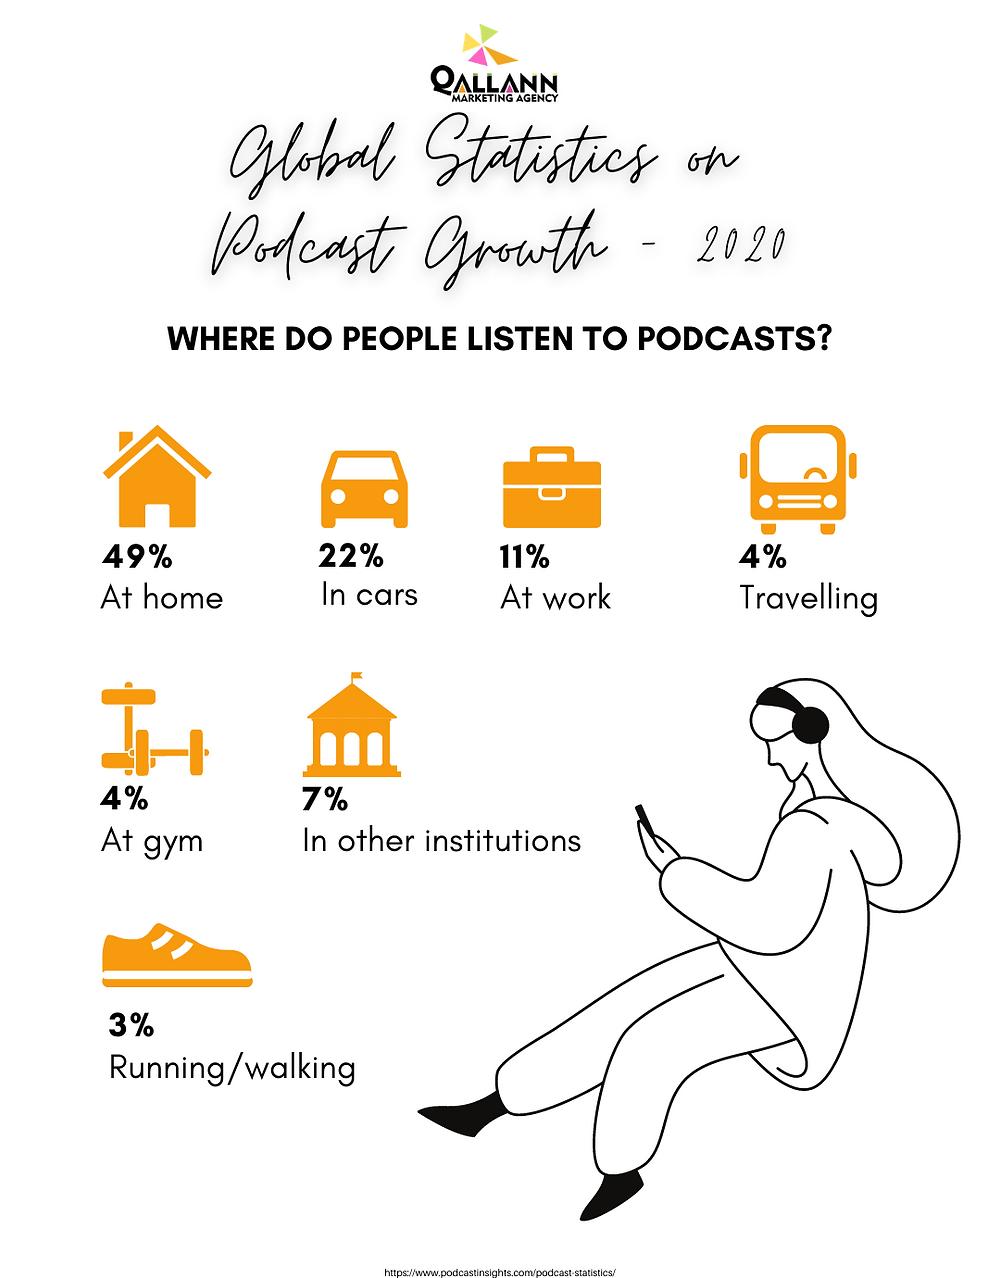 Global Statistics on Podcast Growth - 2020